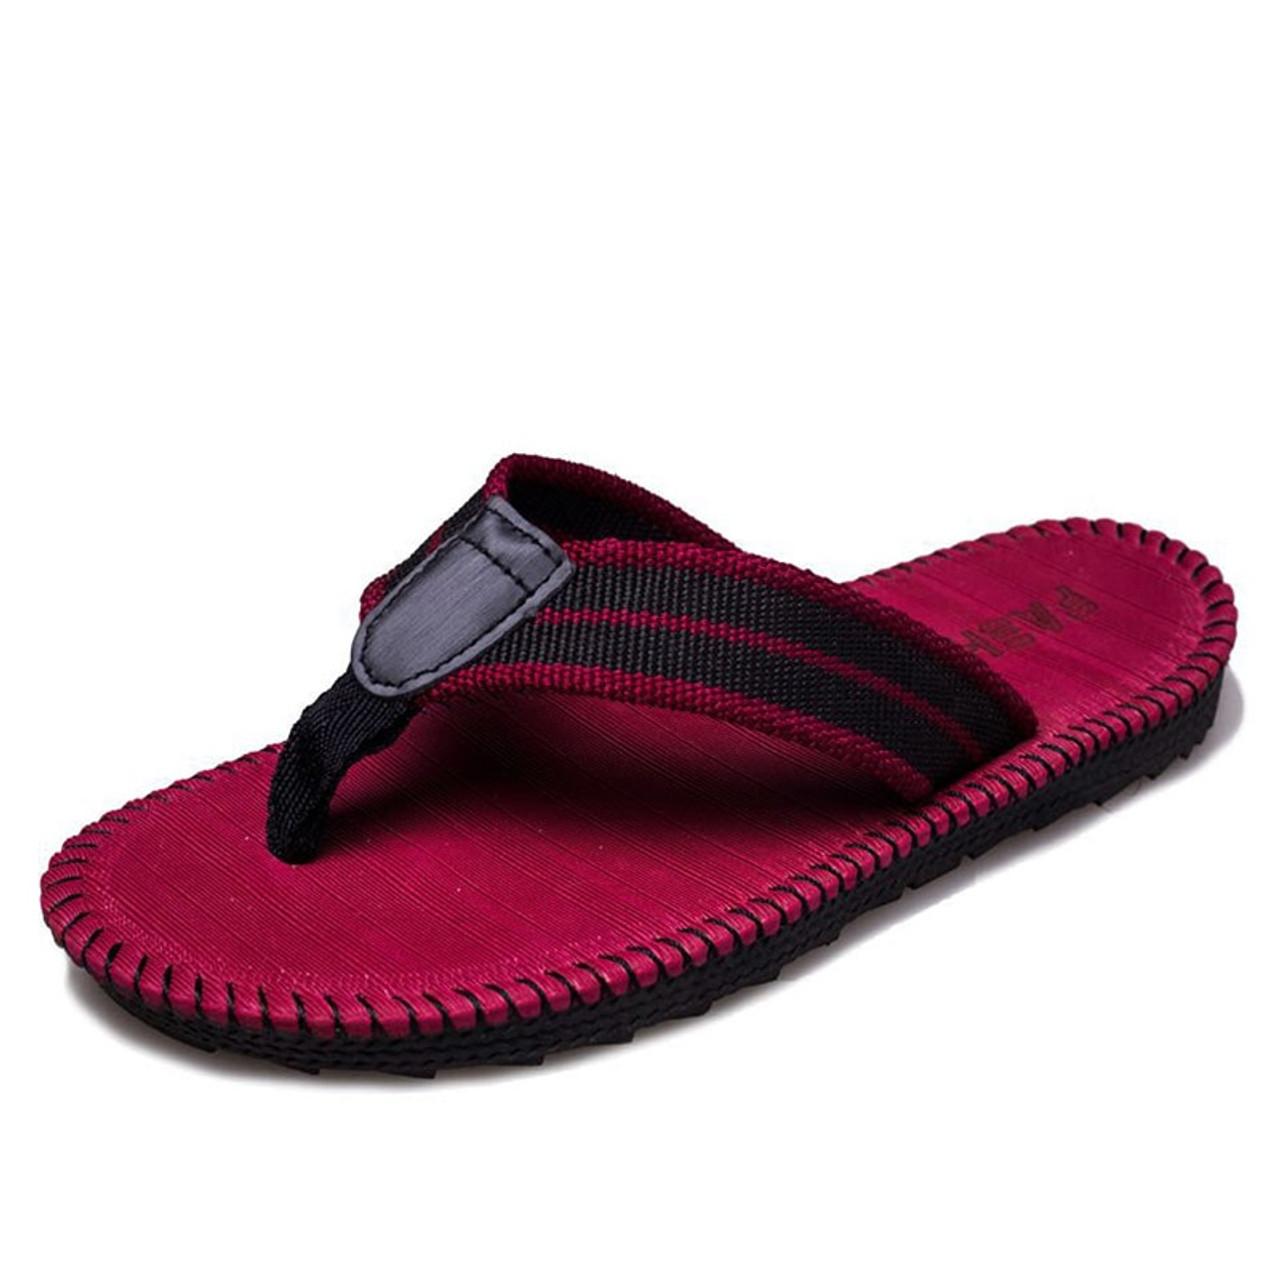 2018 Cool Flip Flops Slippers Sandals